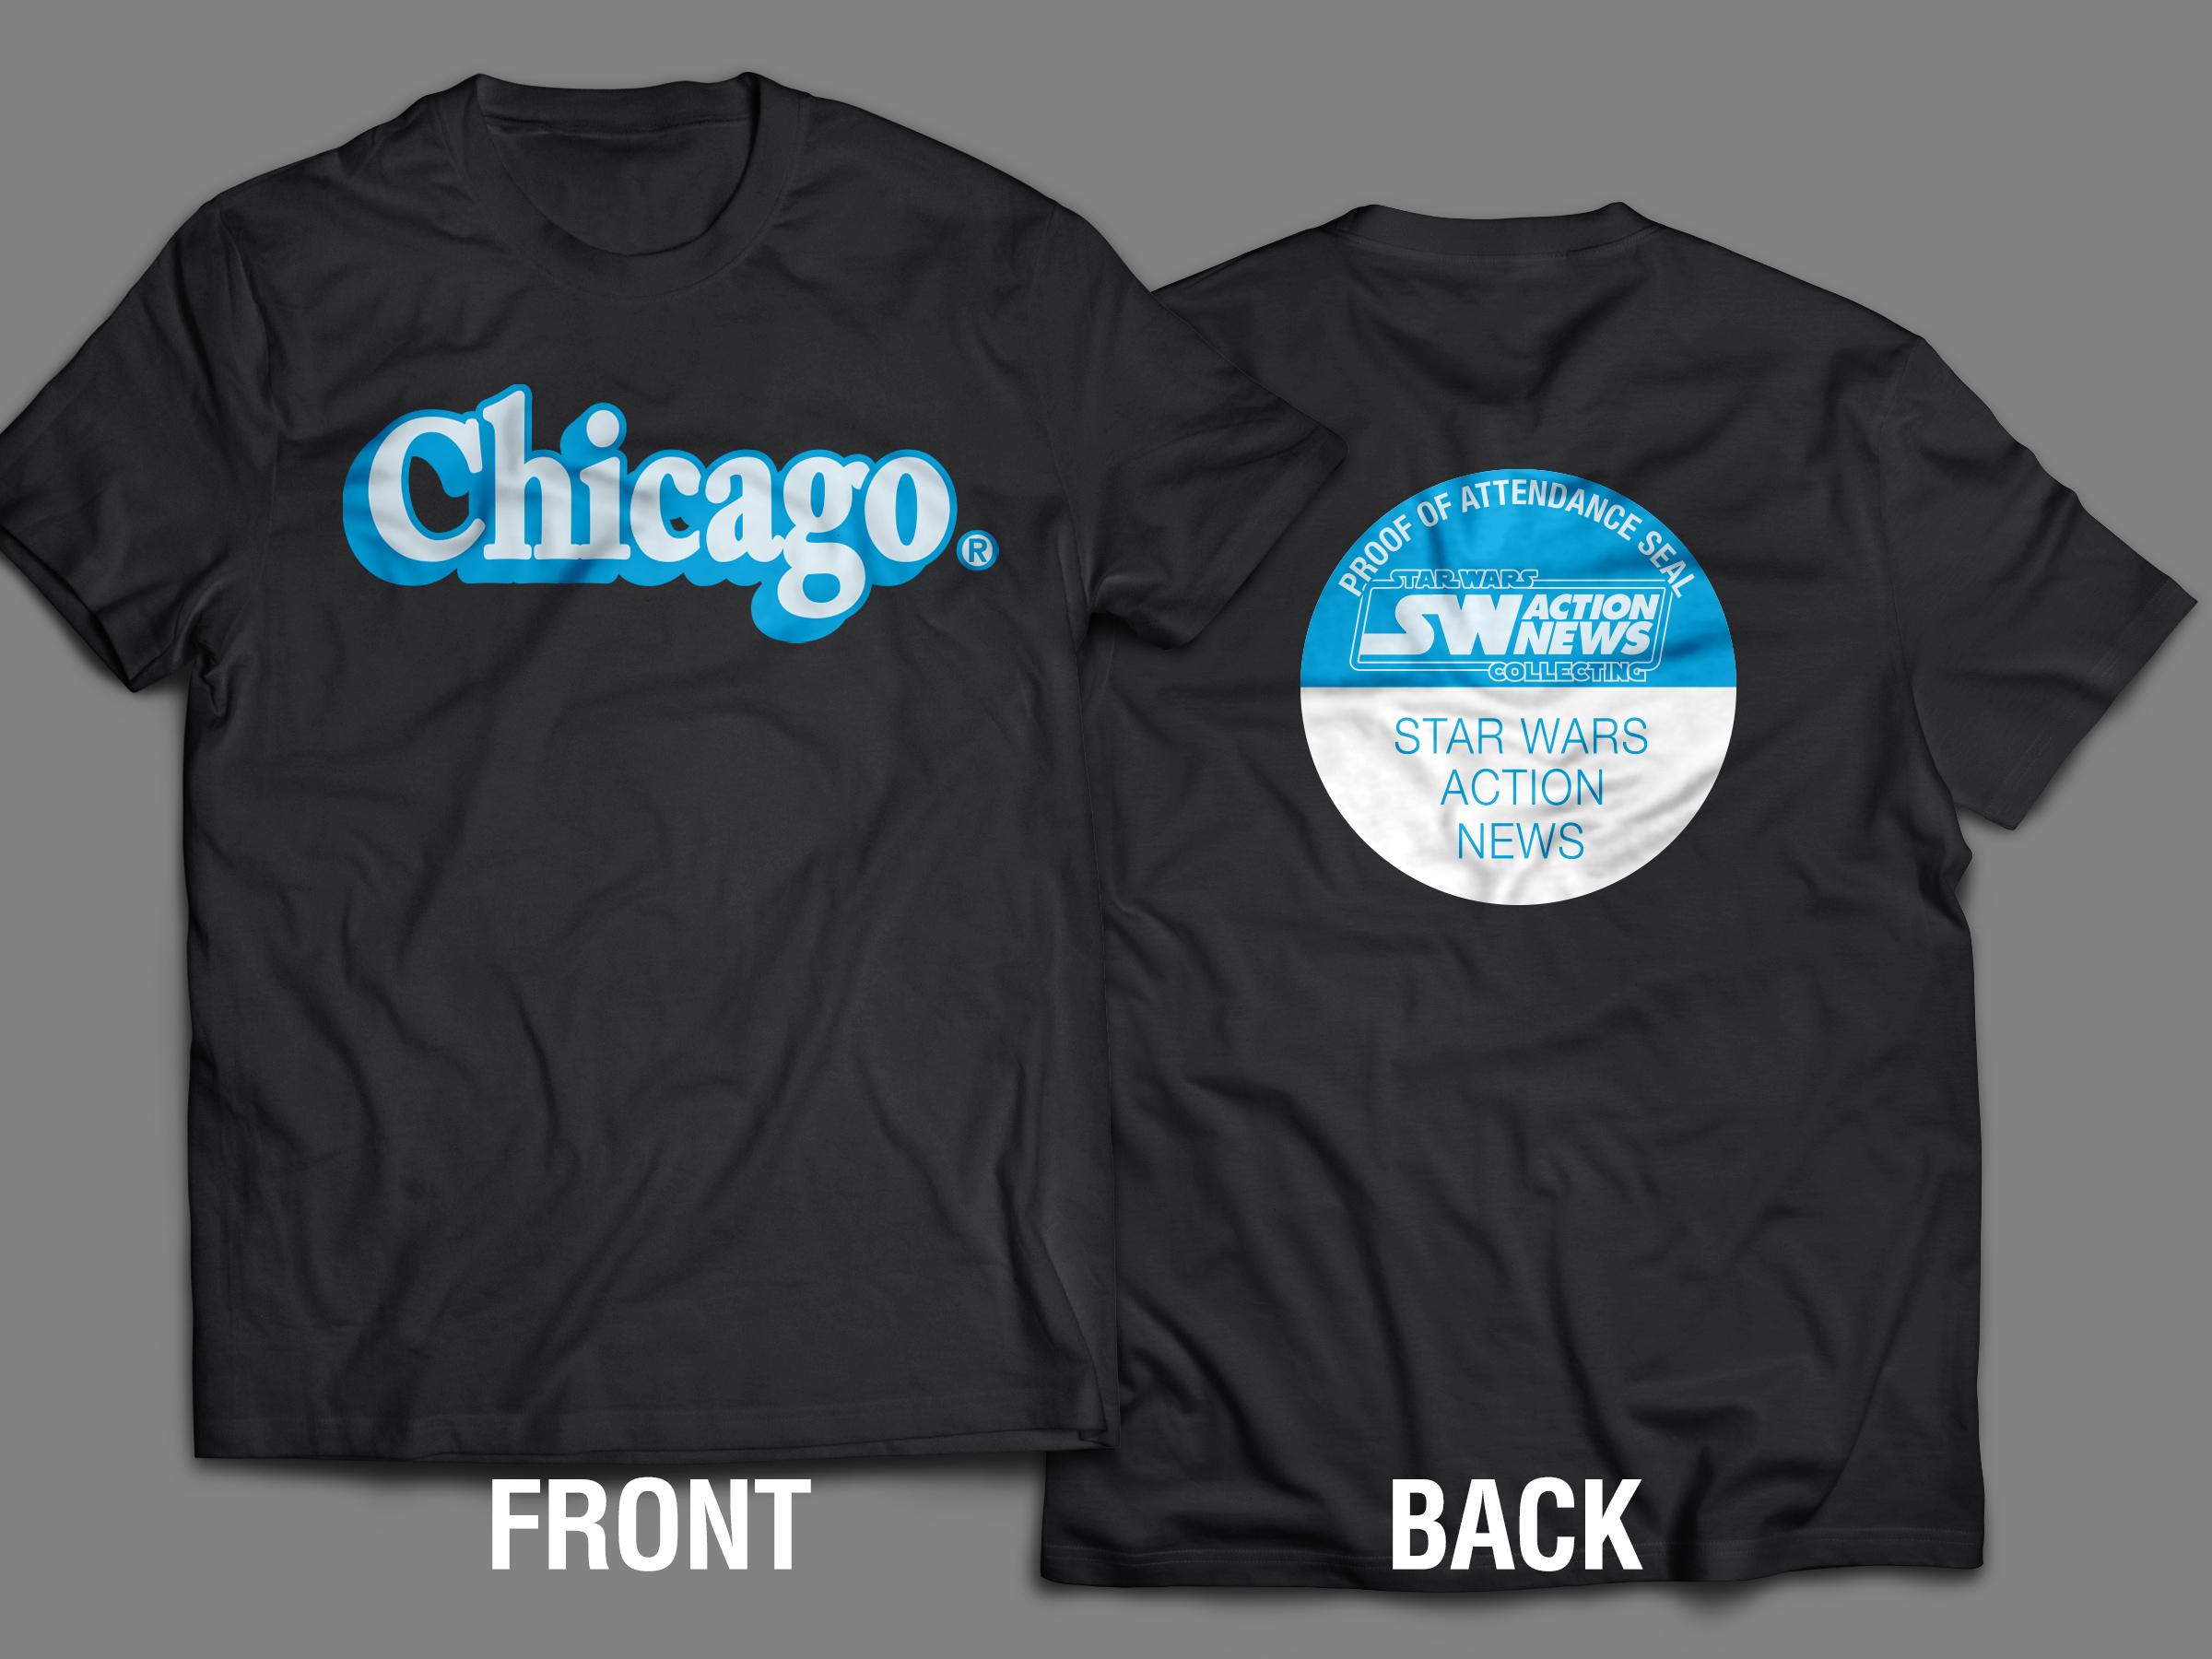 Celebration Chicago Exclusive Shirt